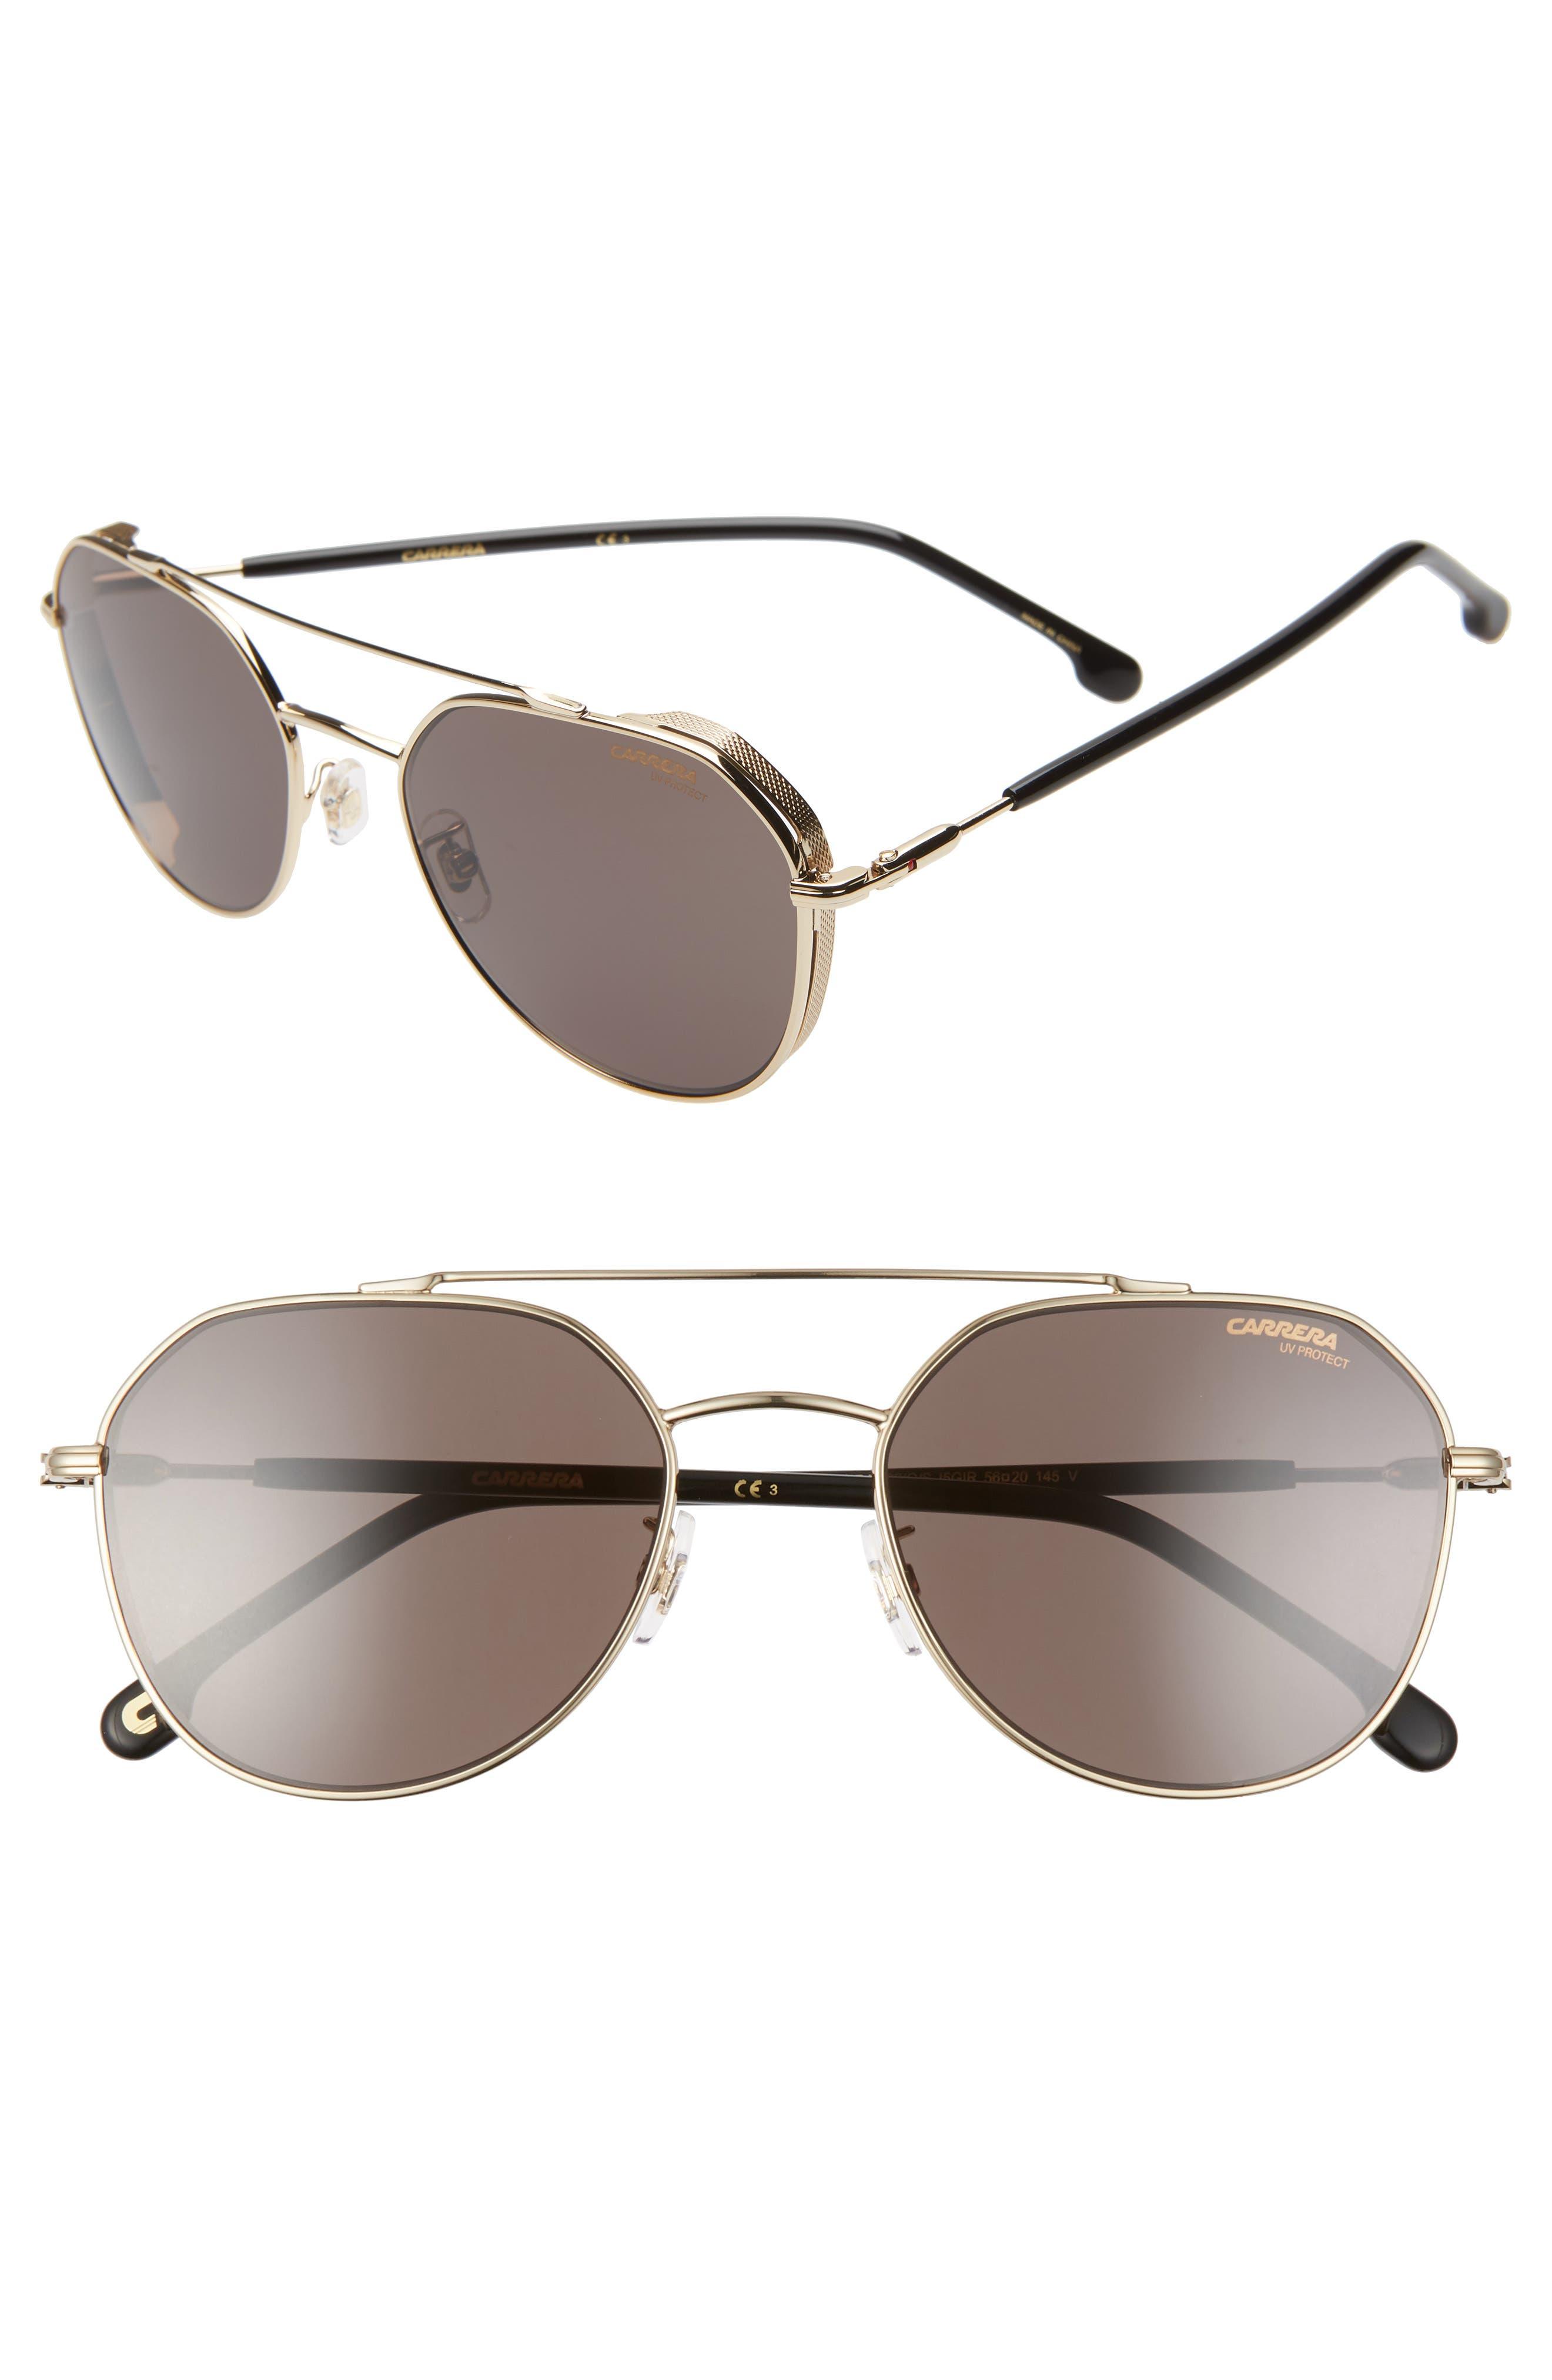 56mm Polarized Aviator Sunglasses